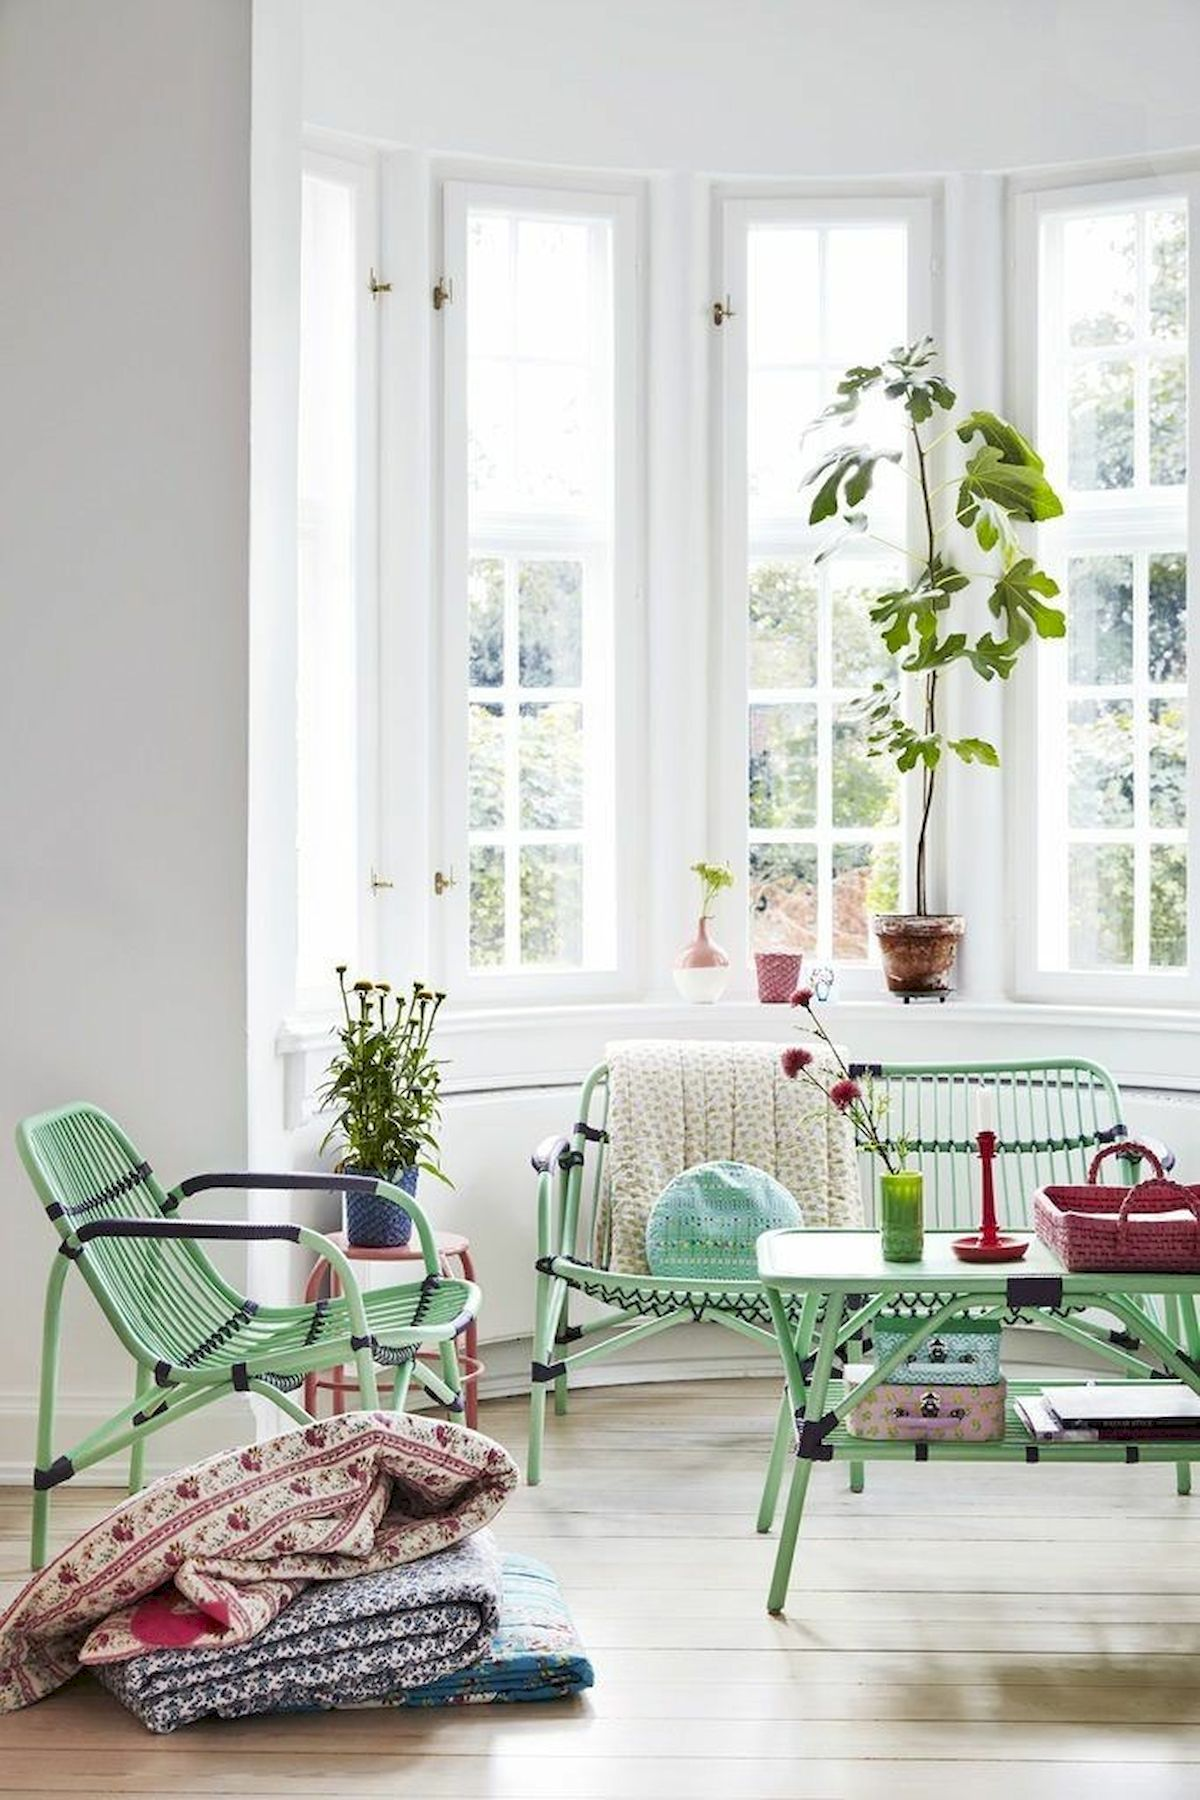 45 Colorful Interior Home Design and Decor Ideas (36)